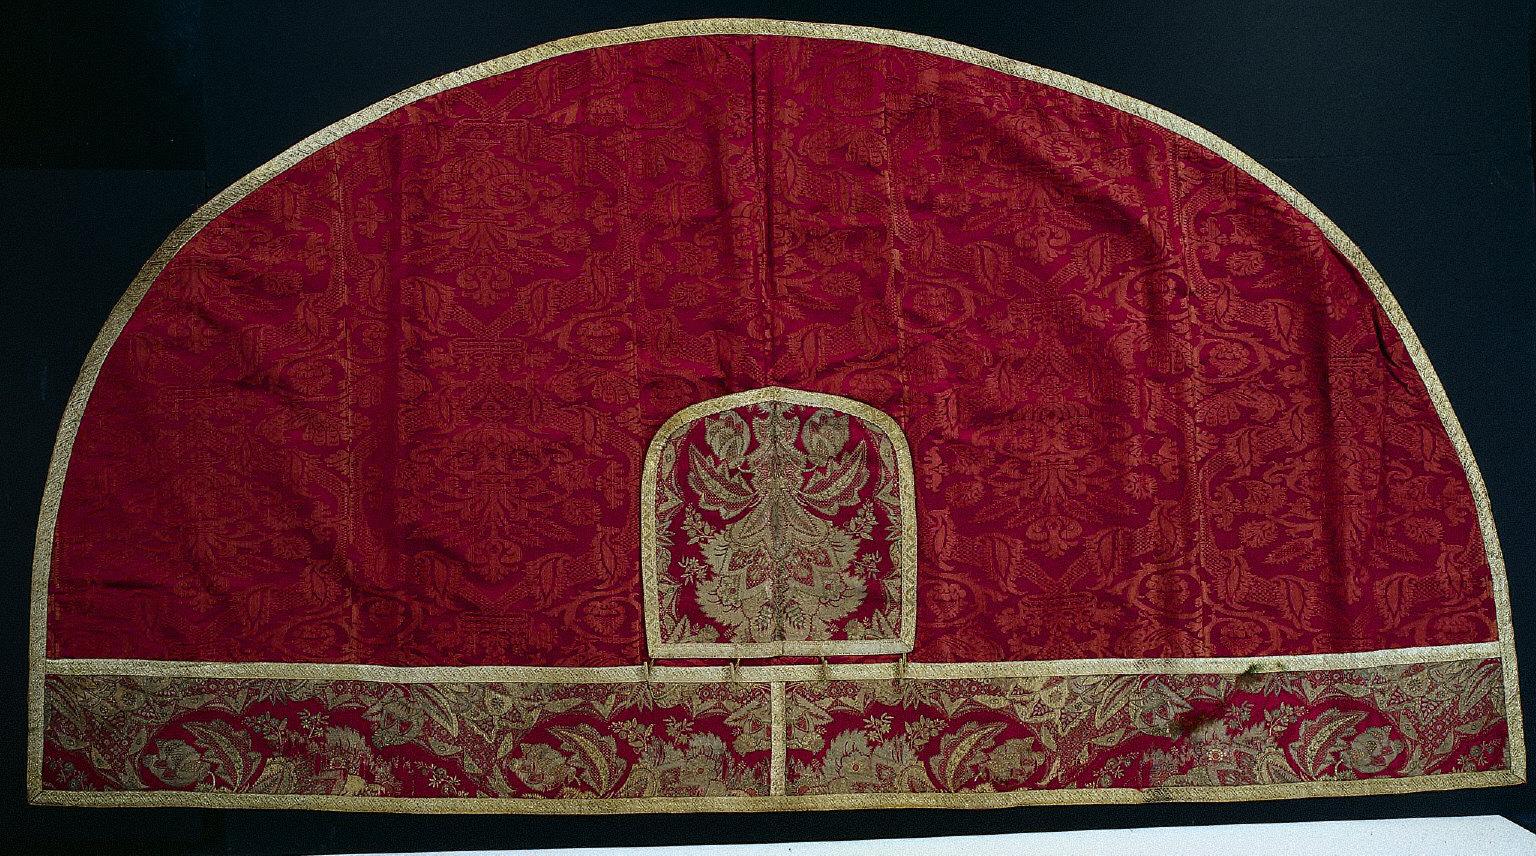 Priest's Red Cope